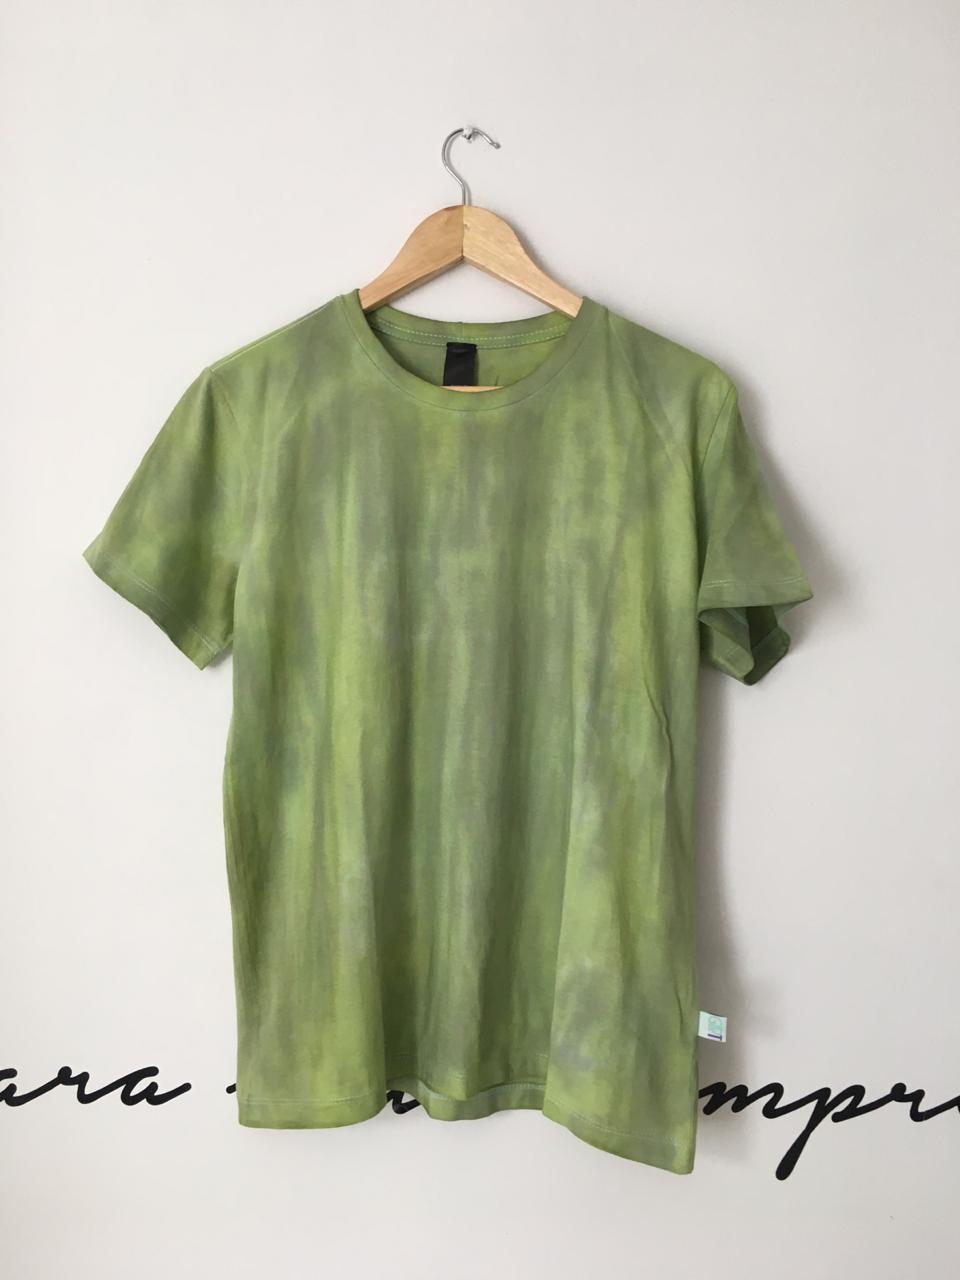 Camiseta Tie Dye - Avocado